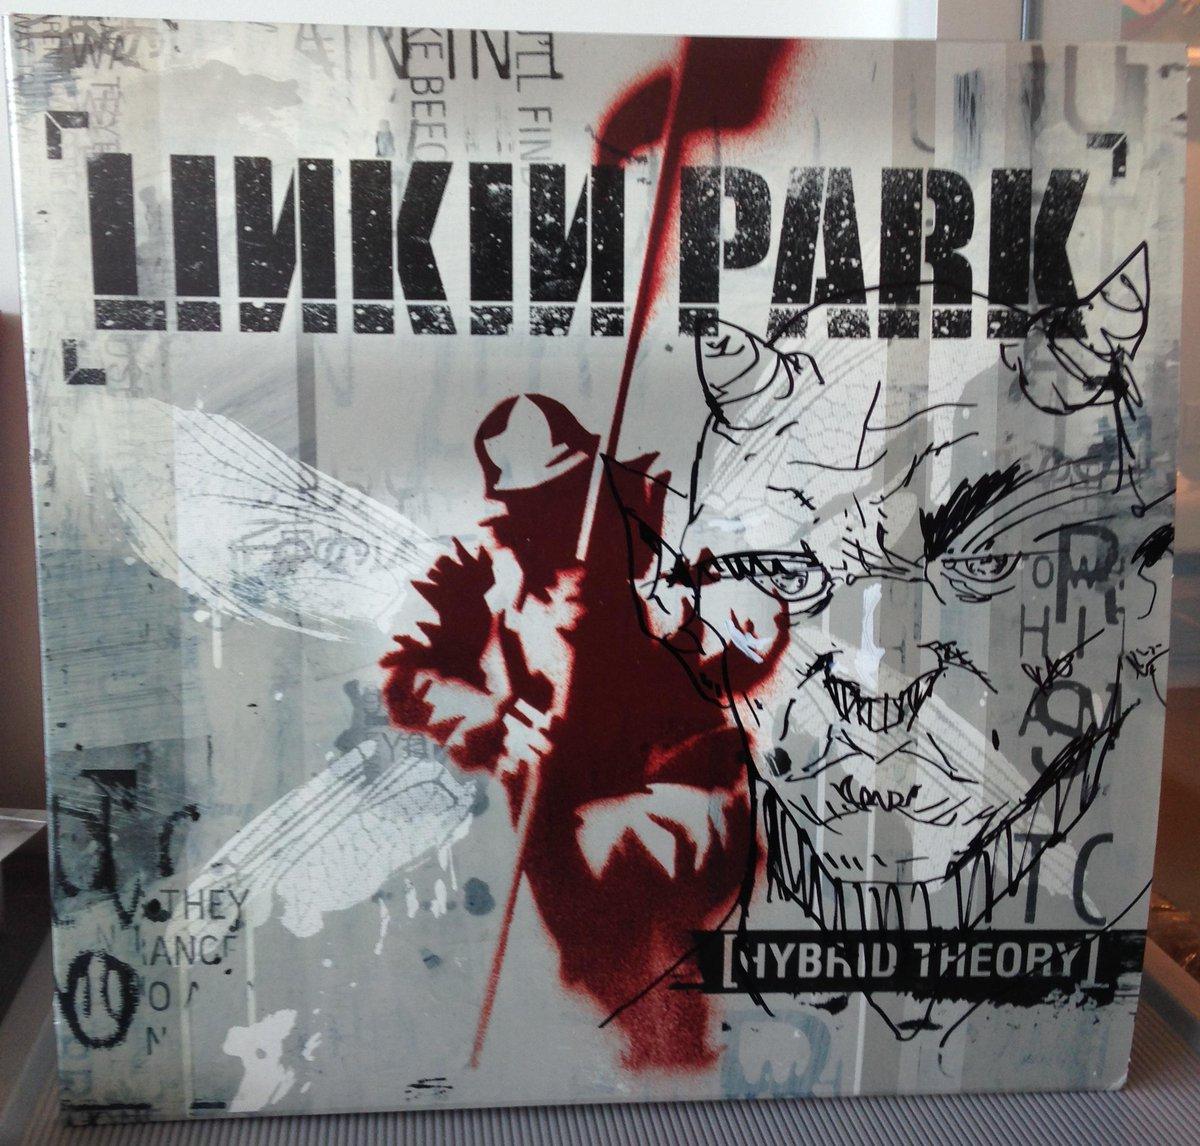 Collect @LinkinPark's rare 2000 #HybridTheory vinyl album w/ hand-drawn artwork by @joehahnLP http://t.co/2xRKOawqmA http://t.co/hLSWOzTmZO